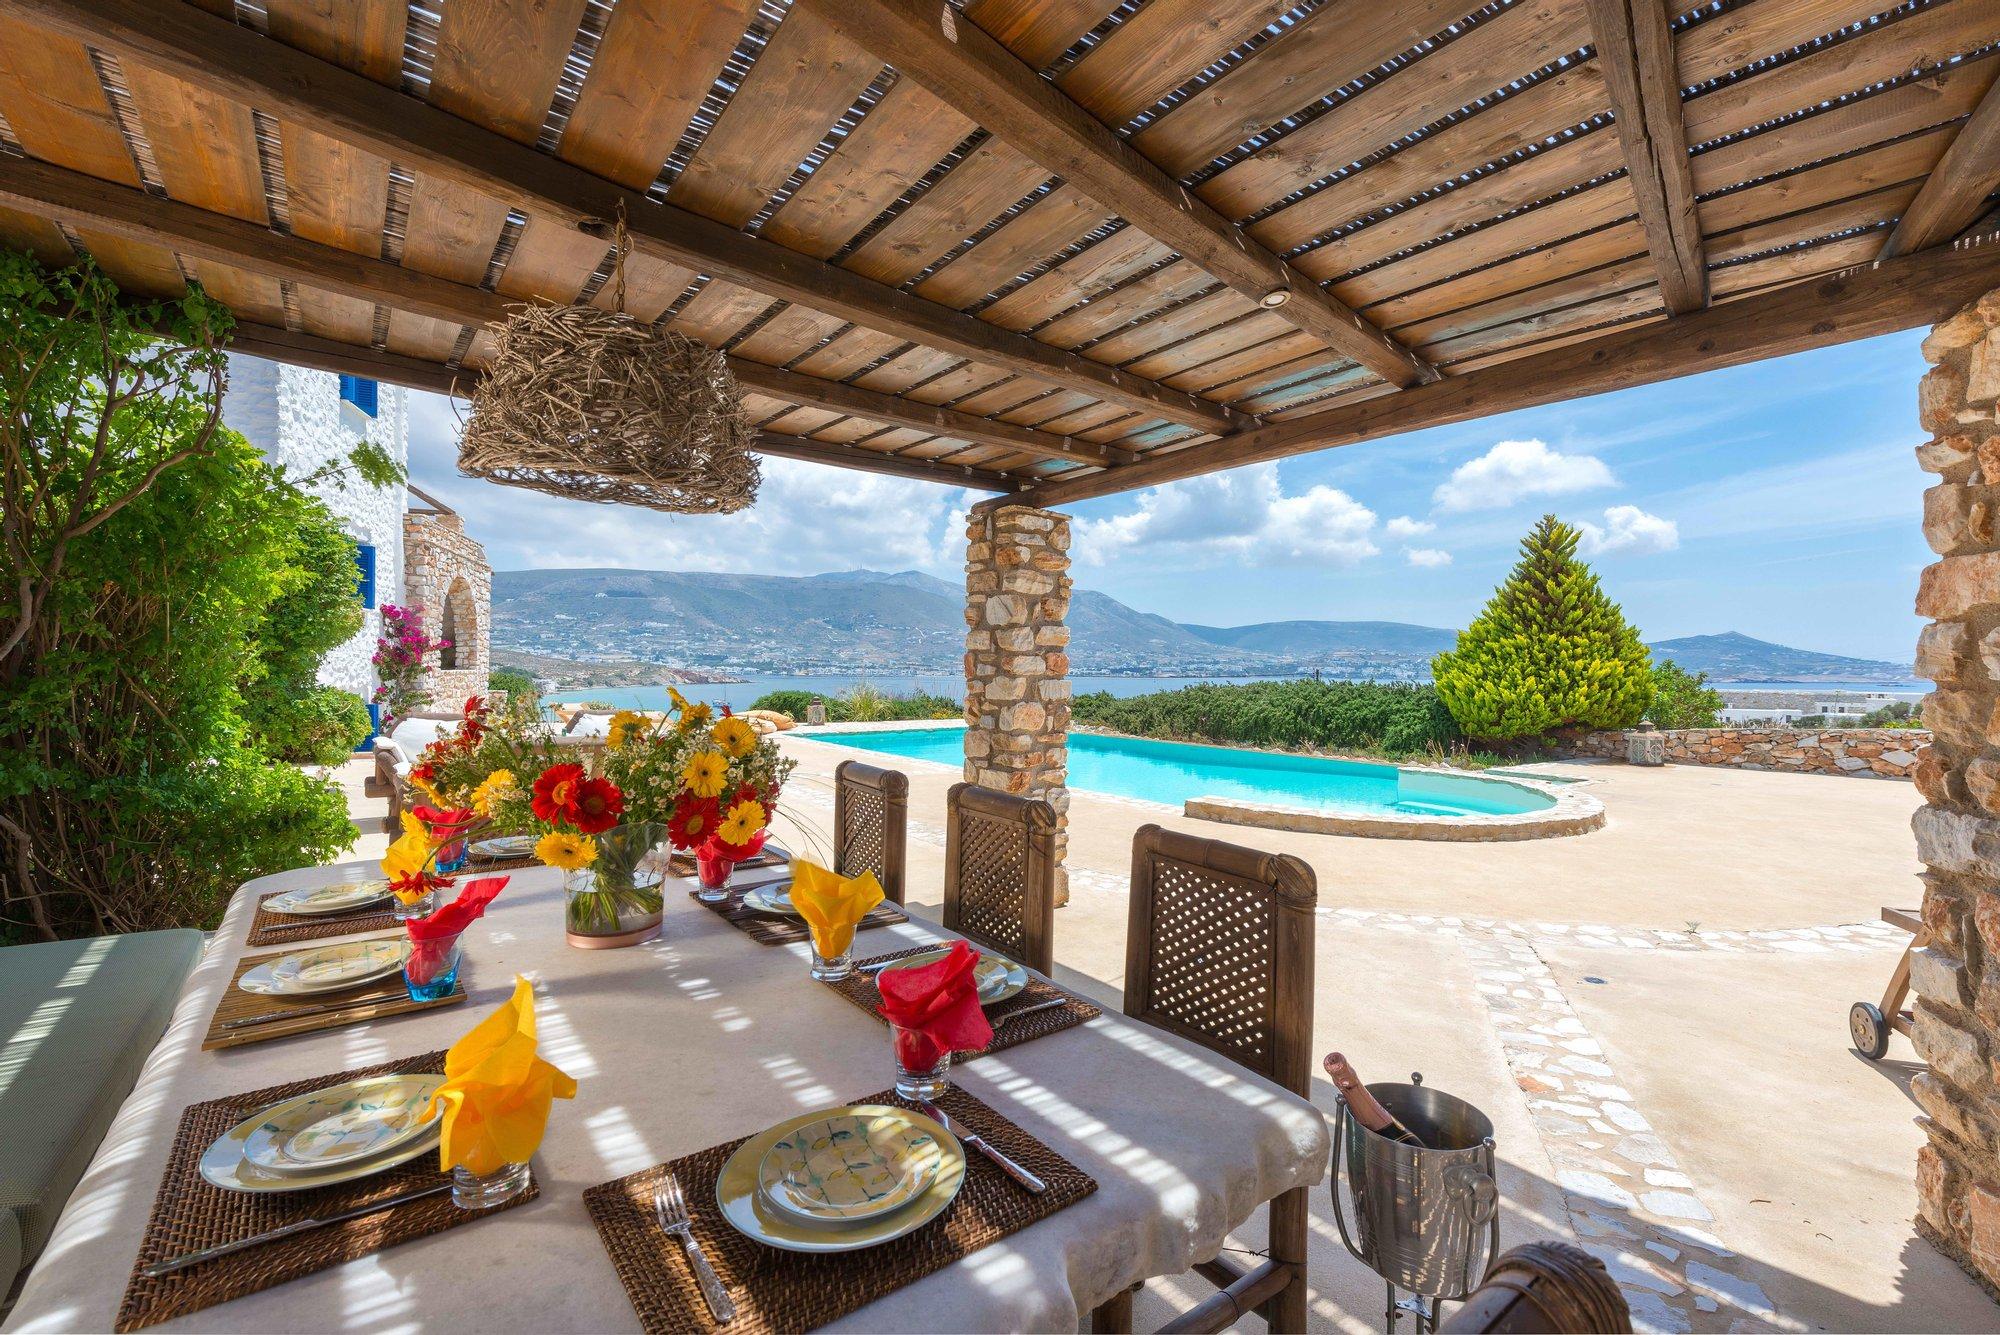 House in Greece 1